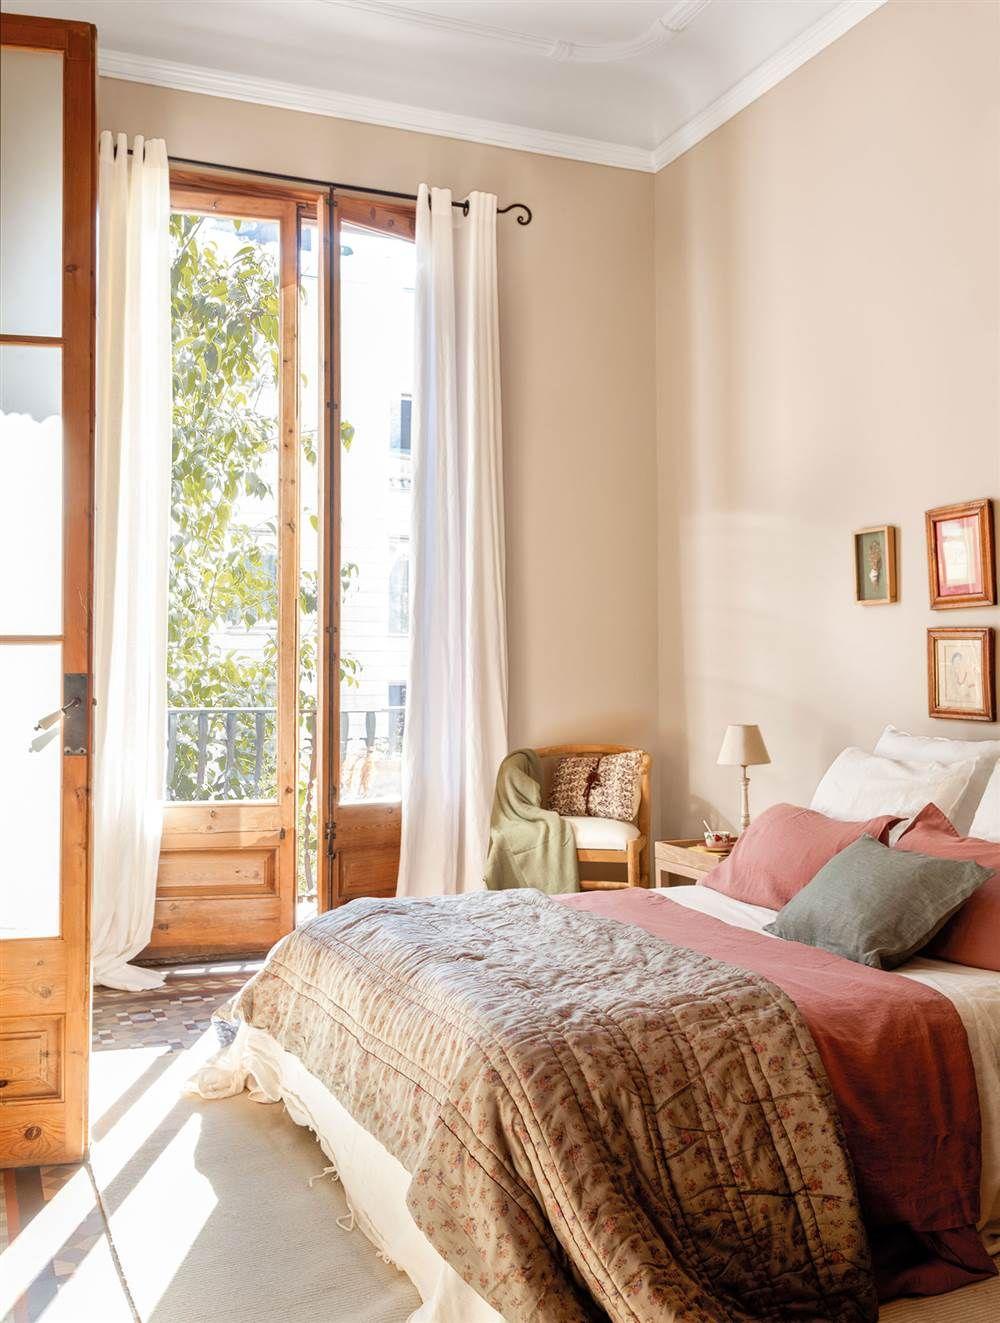 10 ideas low cost para decorar tu dormitorio si compartes for Decorar tu piso con poco dinero